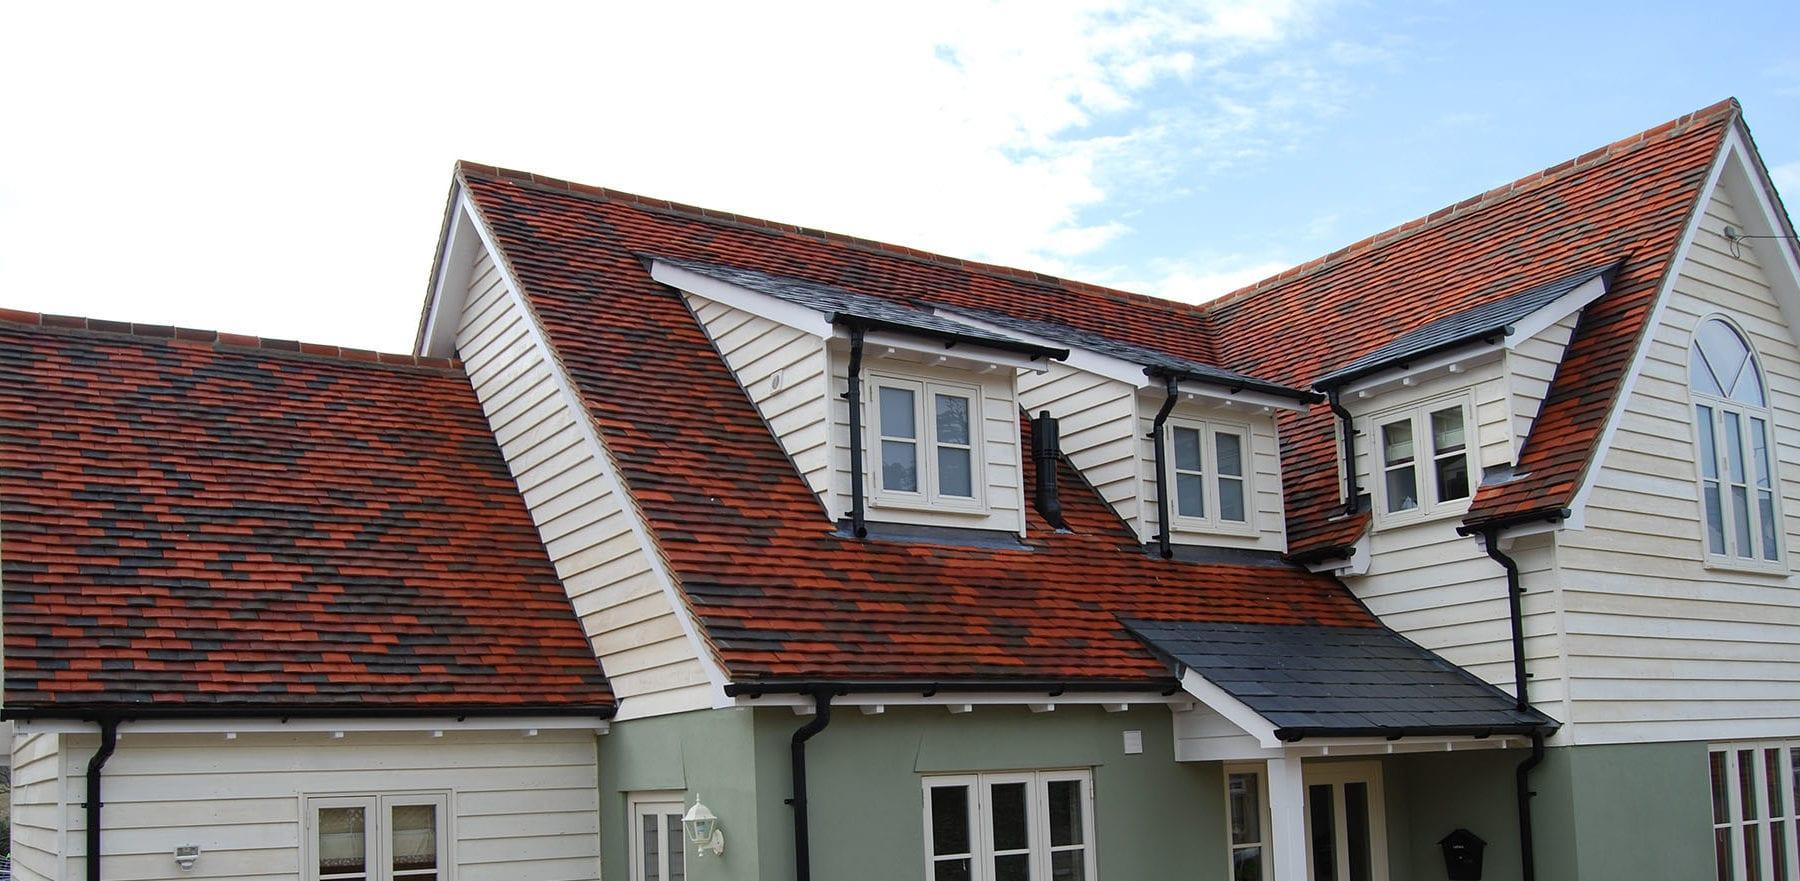 Lifestiles - Handcrafted Tilehurst Clay Roof Tiles - Cranbourne, England 4